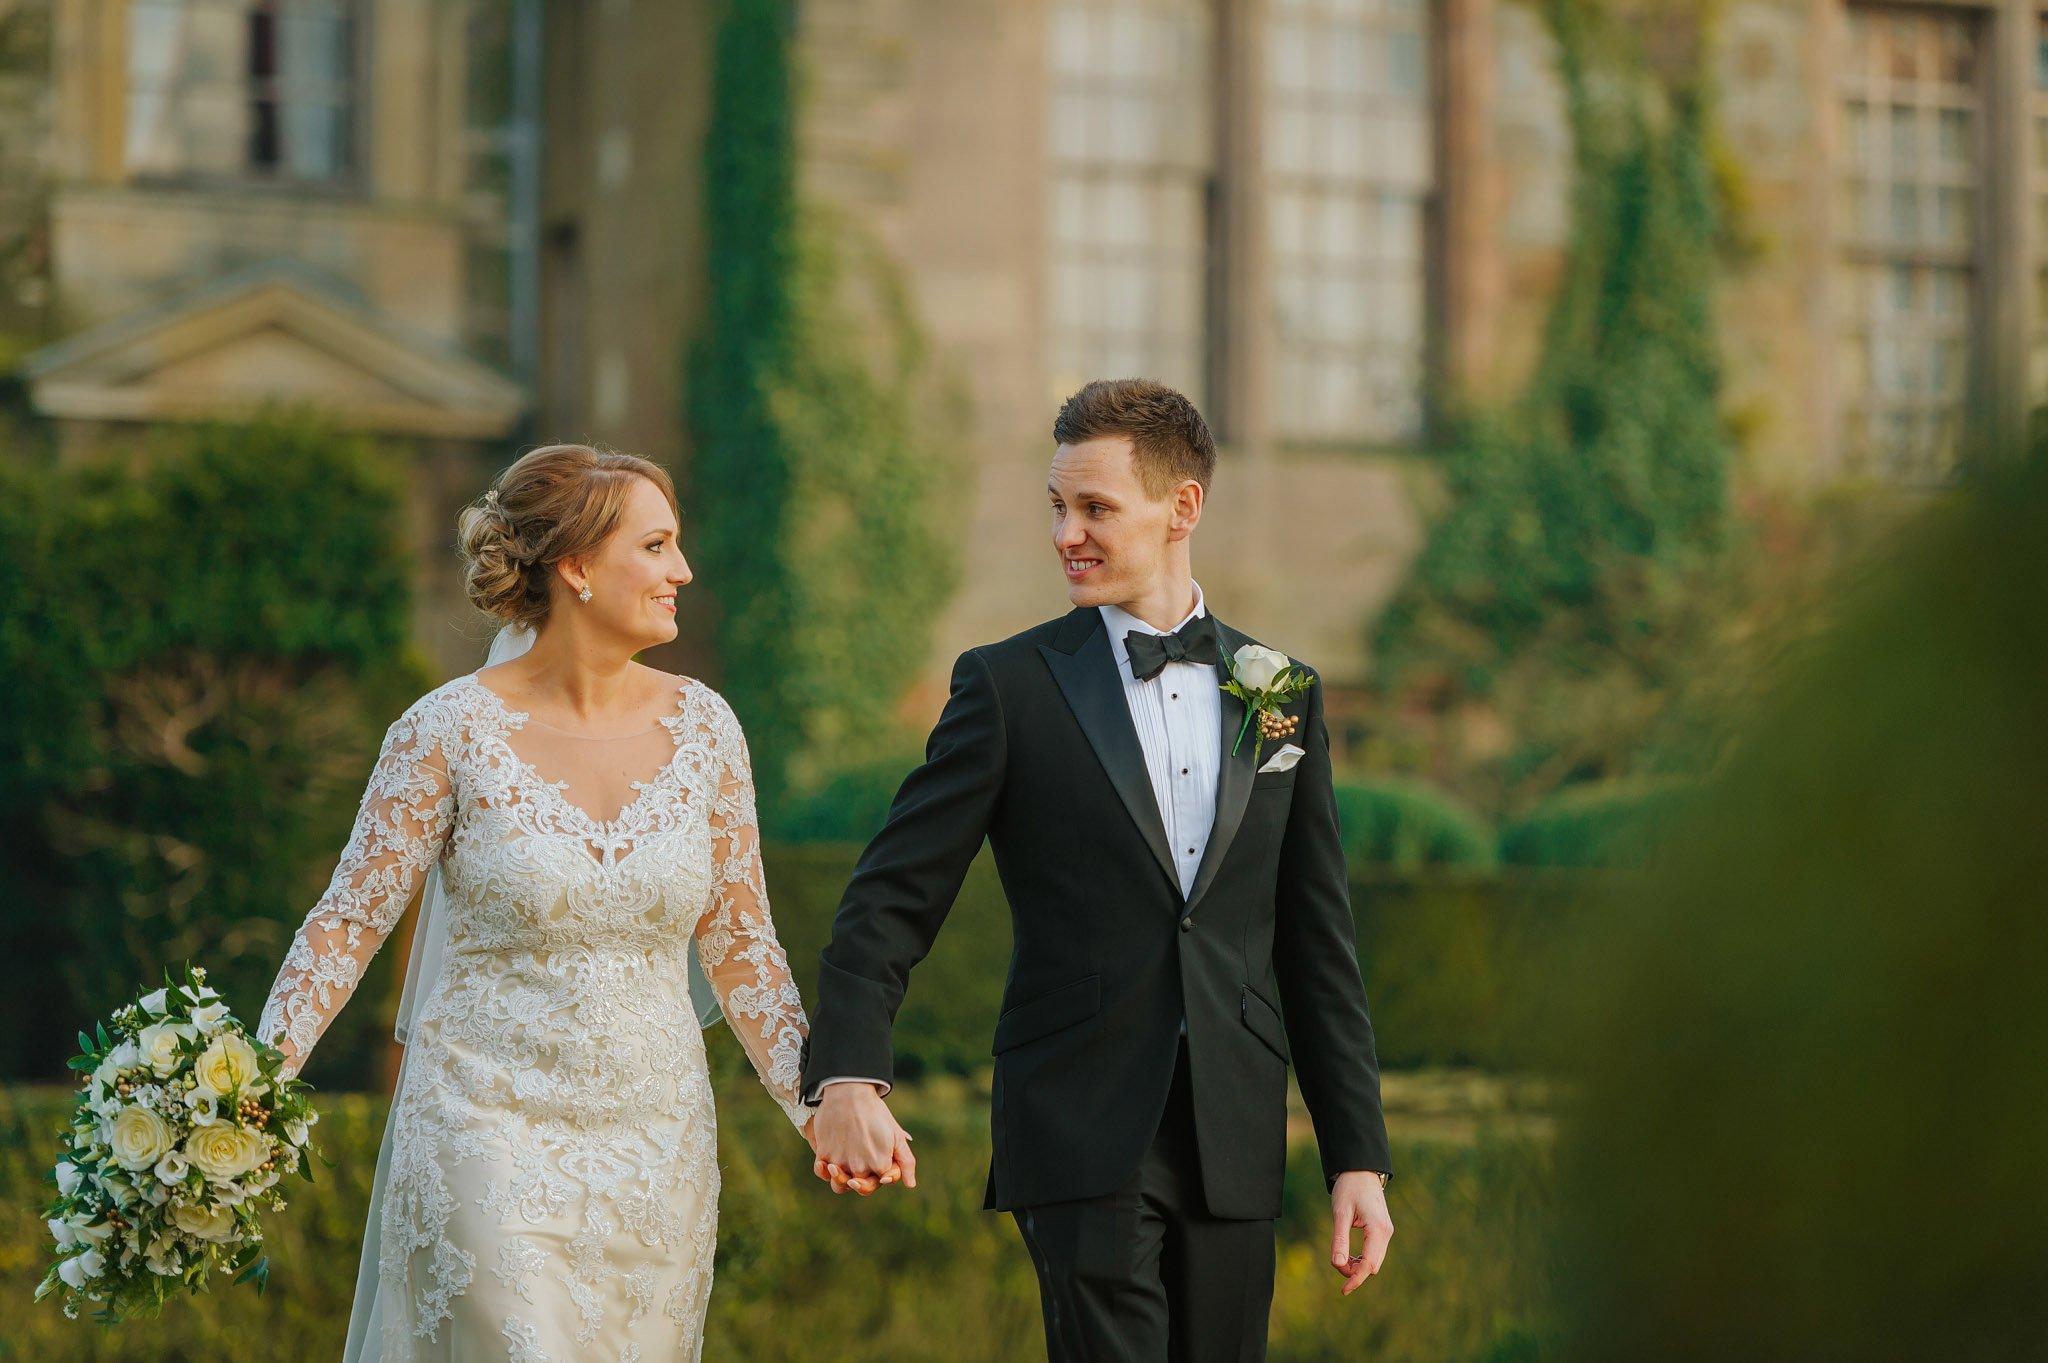 Coombe Abbey wedding in Coventry, Warwickshire - Sam + Matt 43